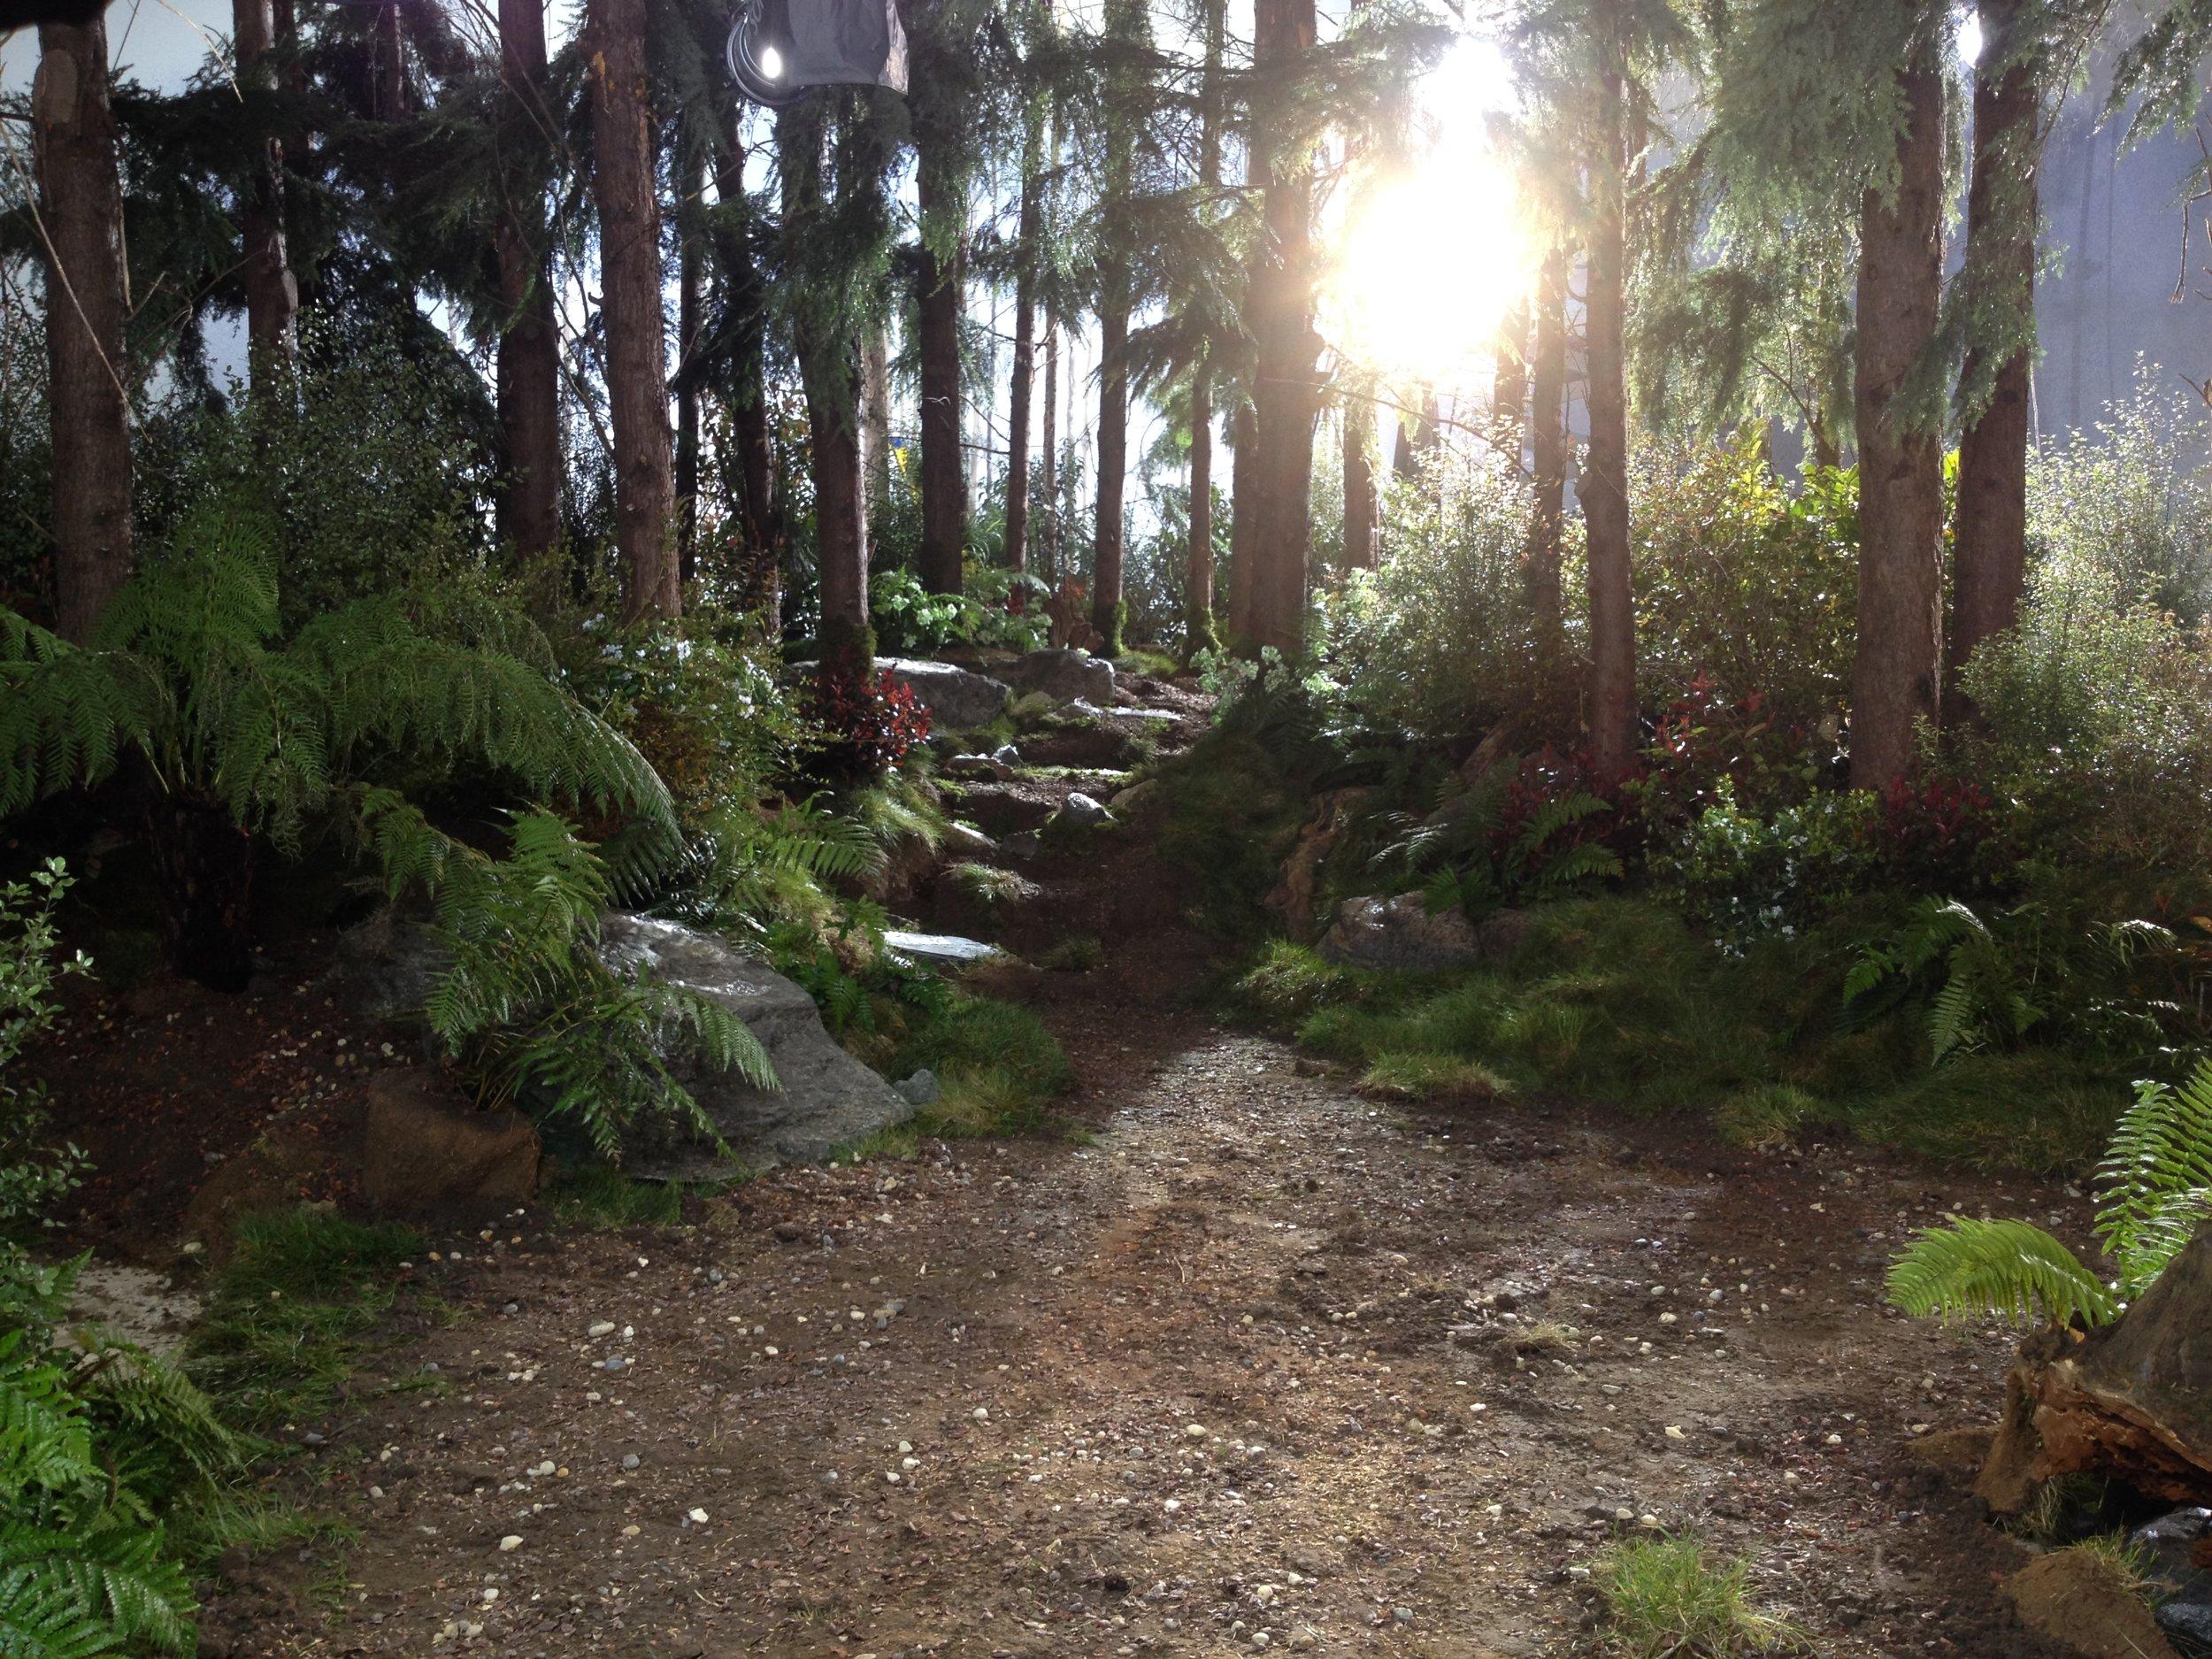 11.bTimotei forest.JPG